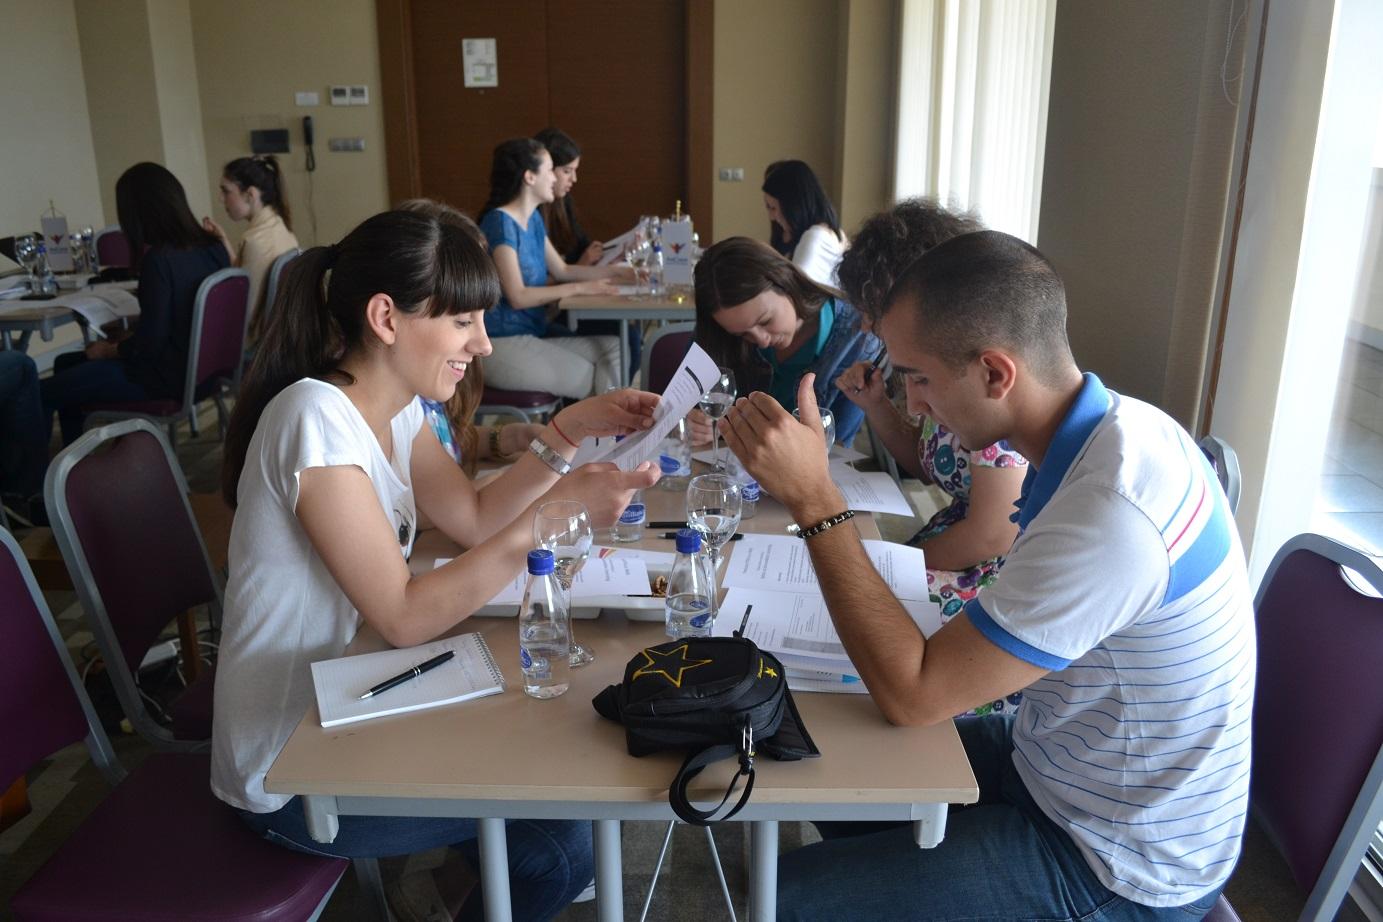 aip workshop interviewing skills amcham aip workshop interviewing skills 2015 12